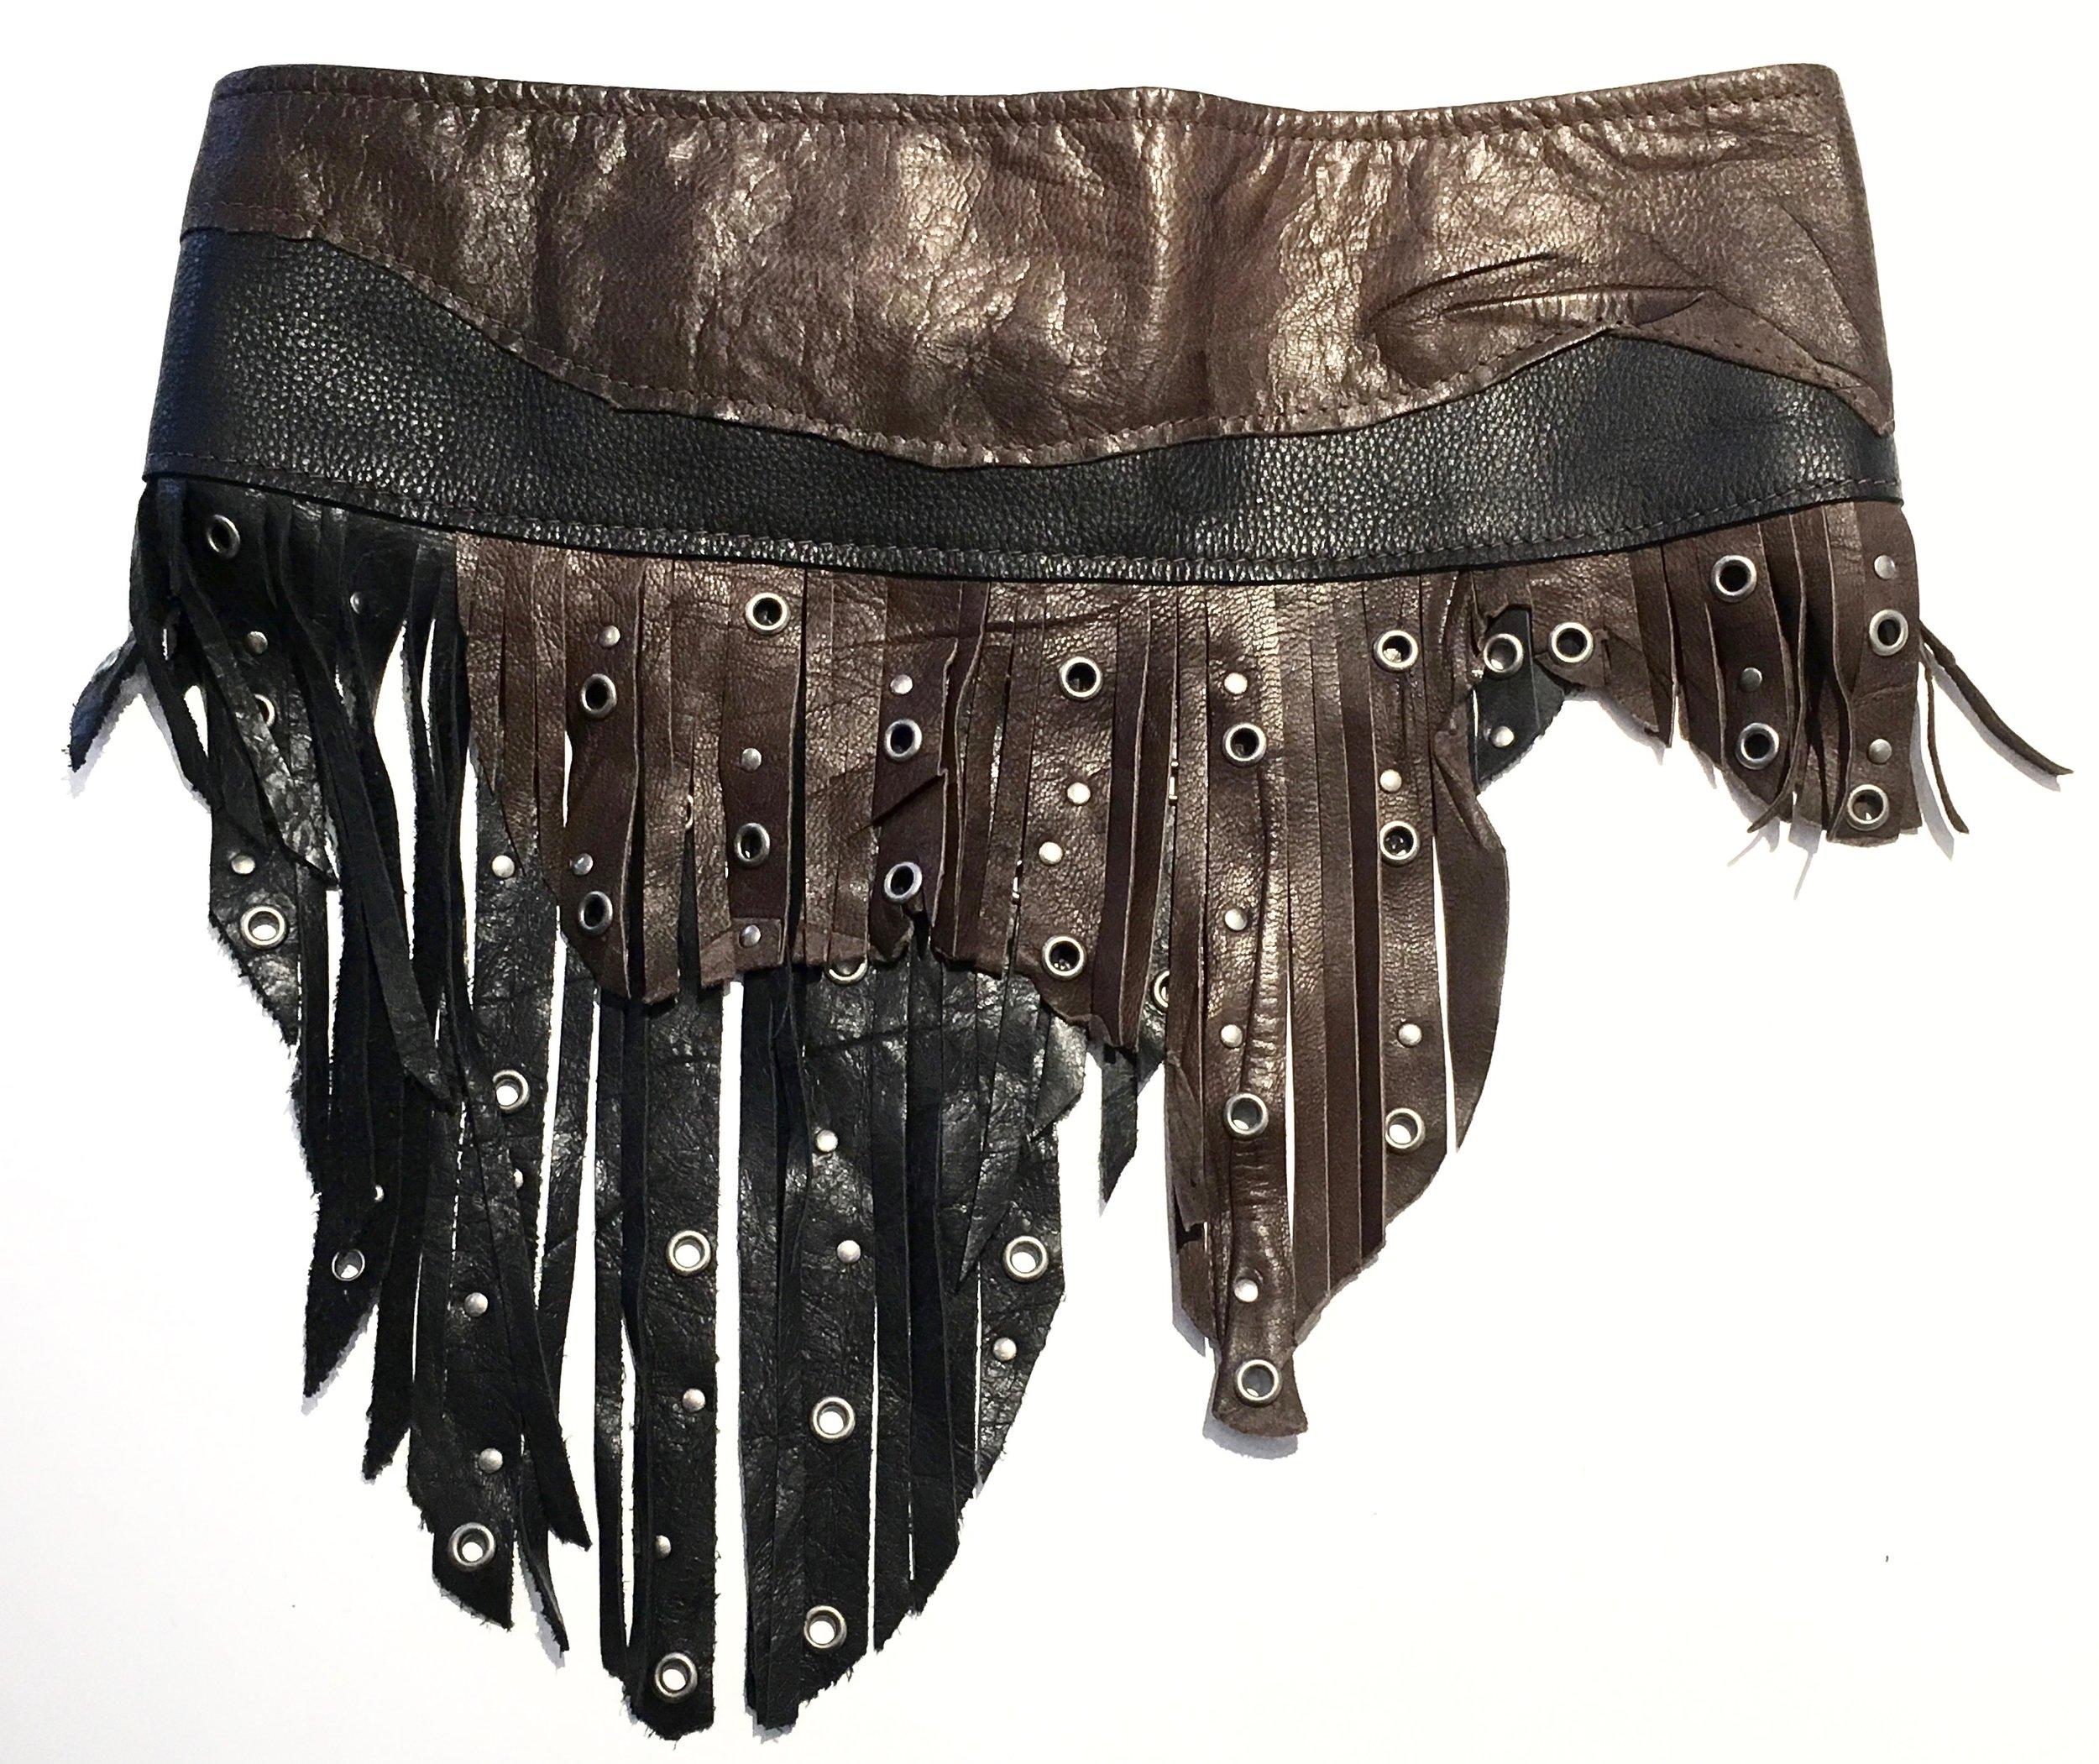 Black and brown cowhide with layered fringe and antiqued nickel metal work. Back view.jpg